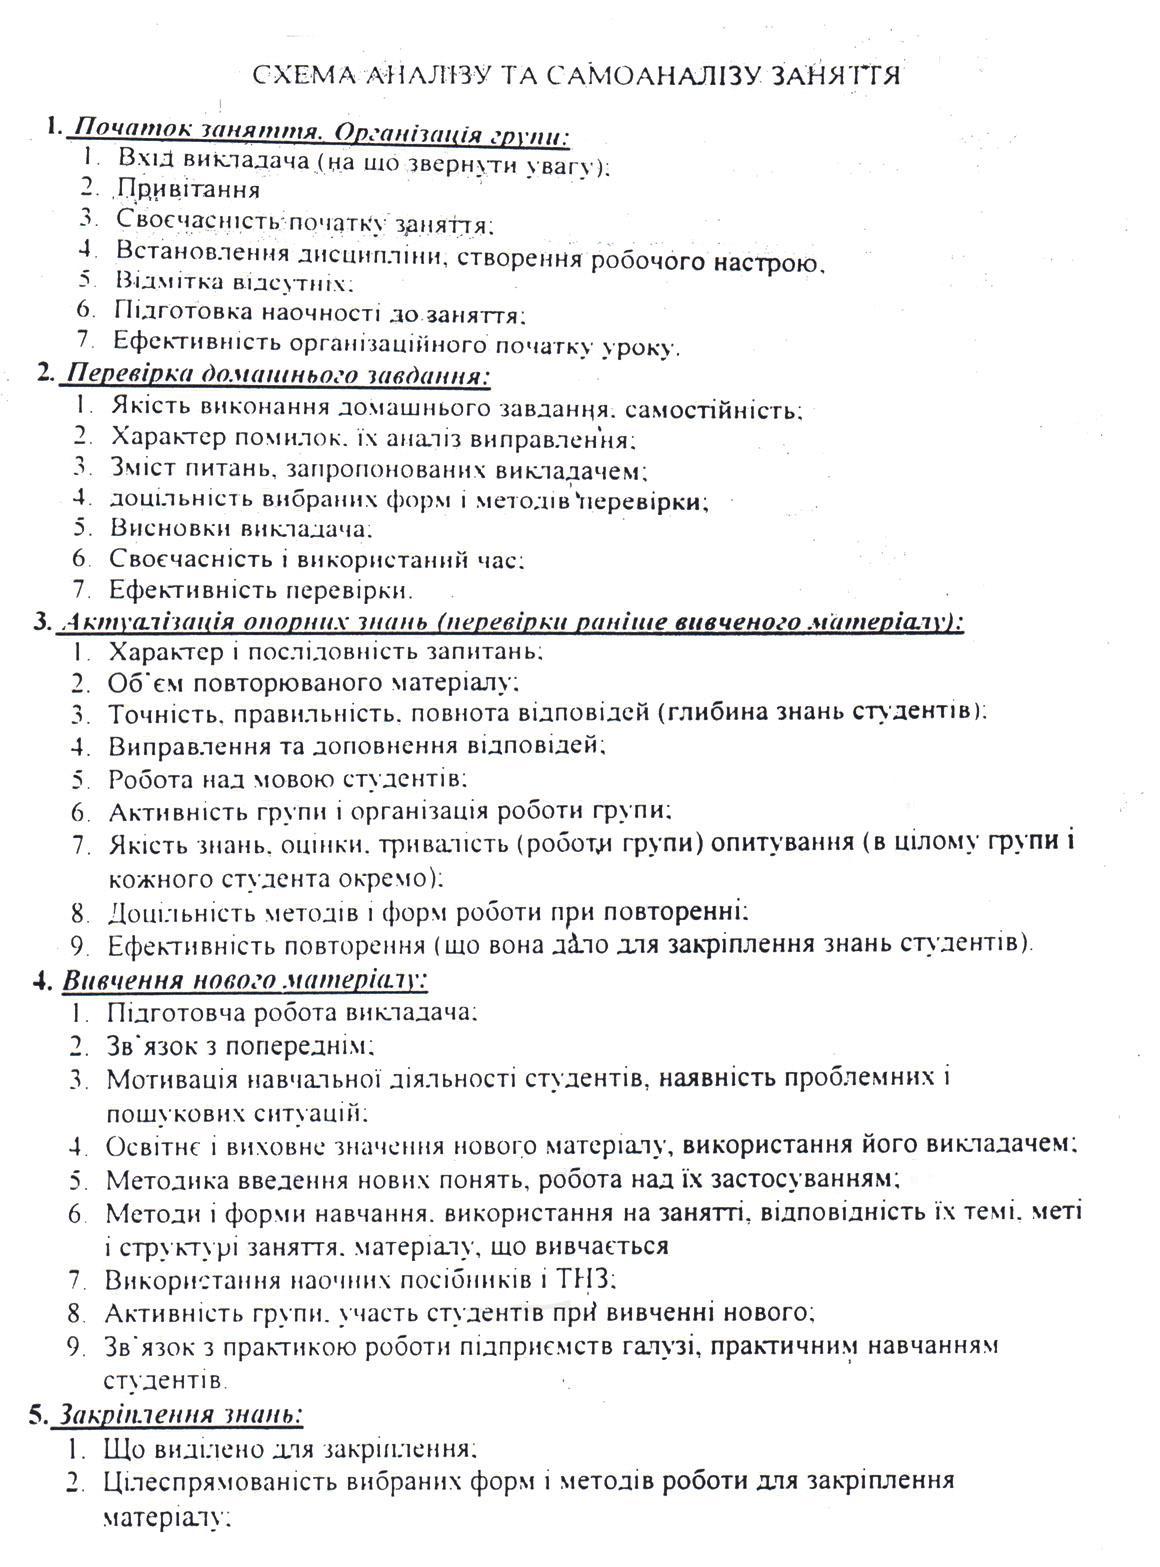 C:\Documents and Settings\Admin\Мои документы\Мои рисунки\схема0001.jpg